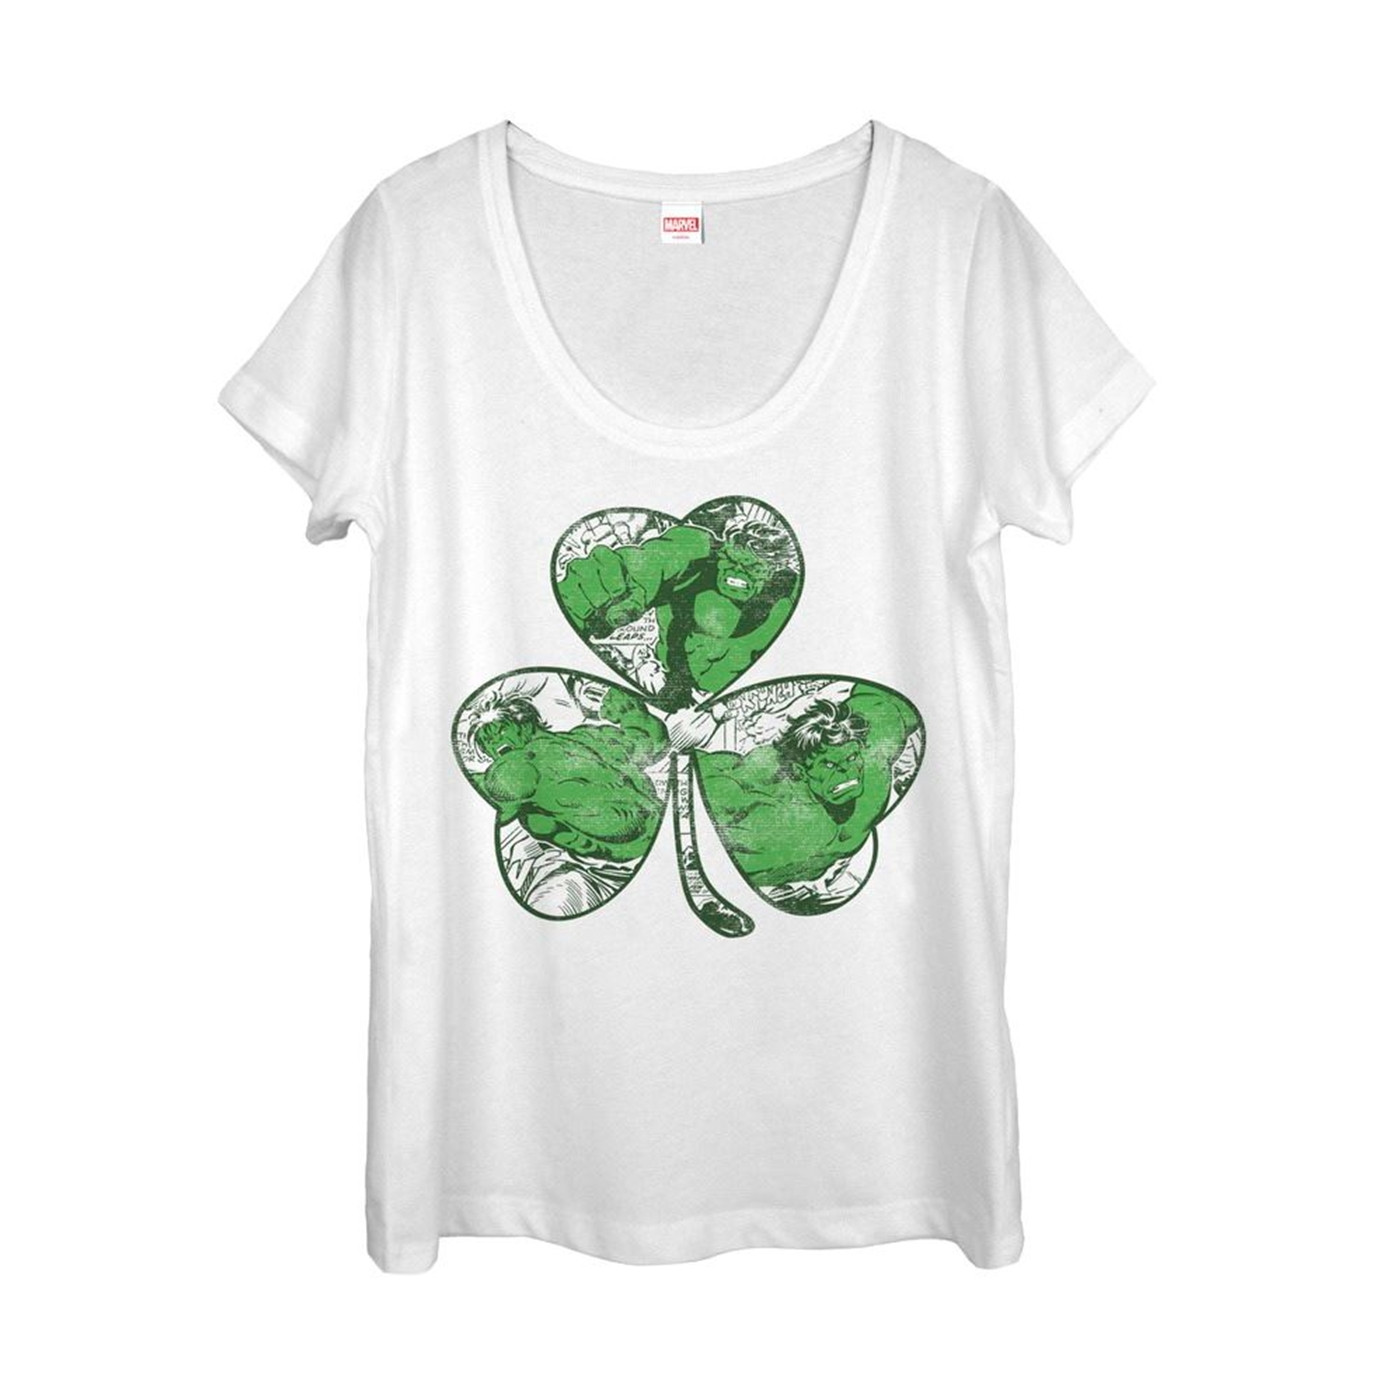 The Hulk Shamrock Womens St Patrick's Day T-Shirt